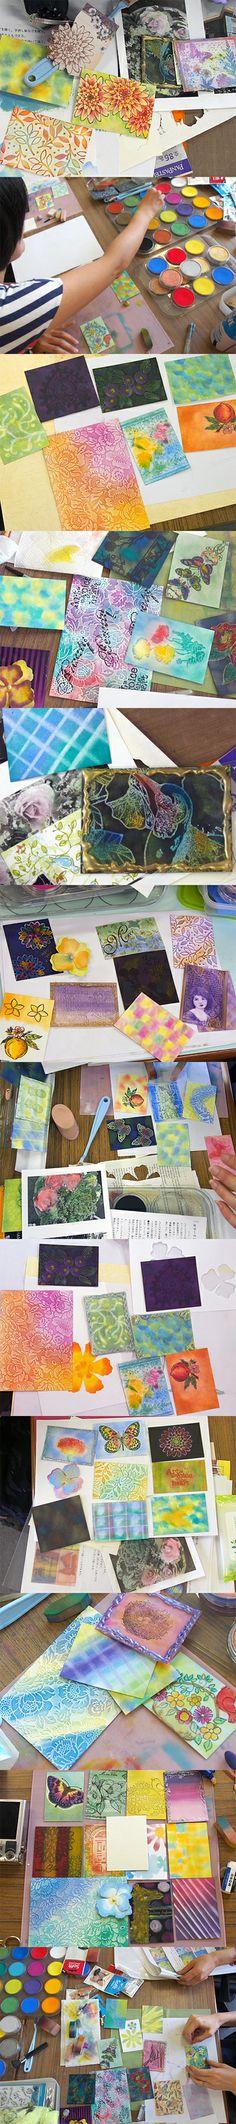 "Pan Pastel Workshop ""Coloring for stamping"" vol.1"